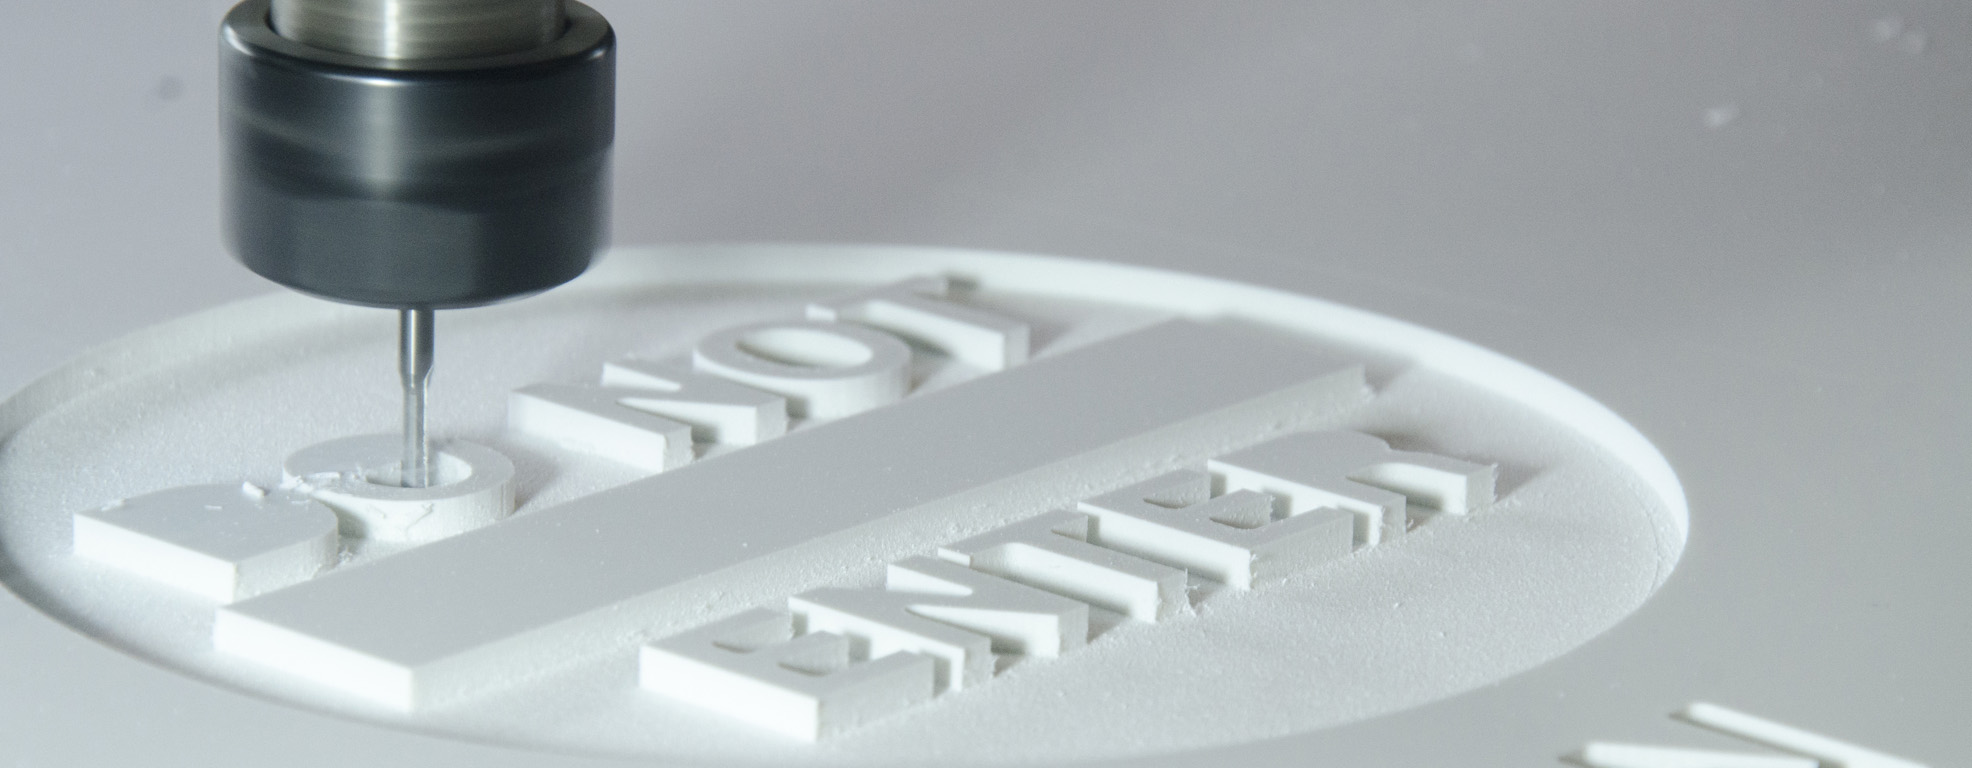 El control numérico (CNC),